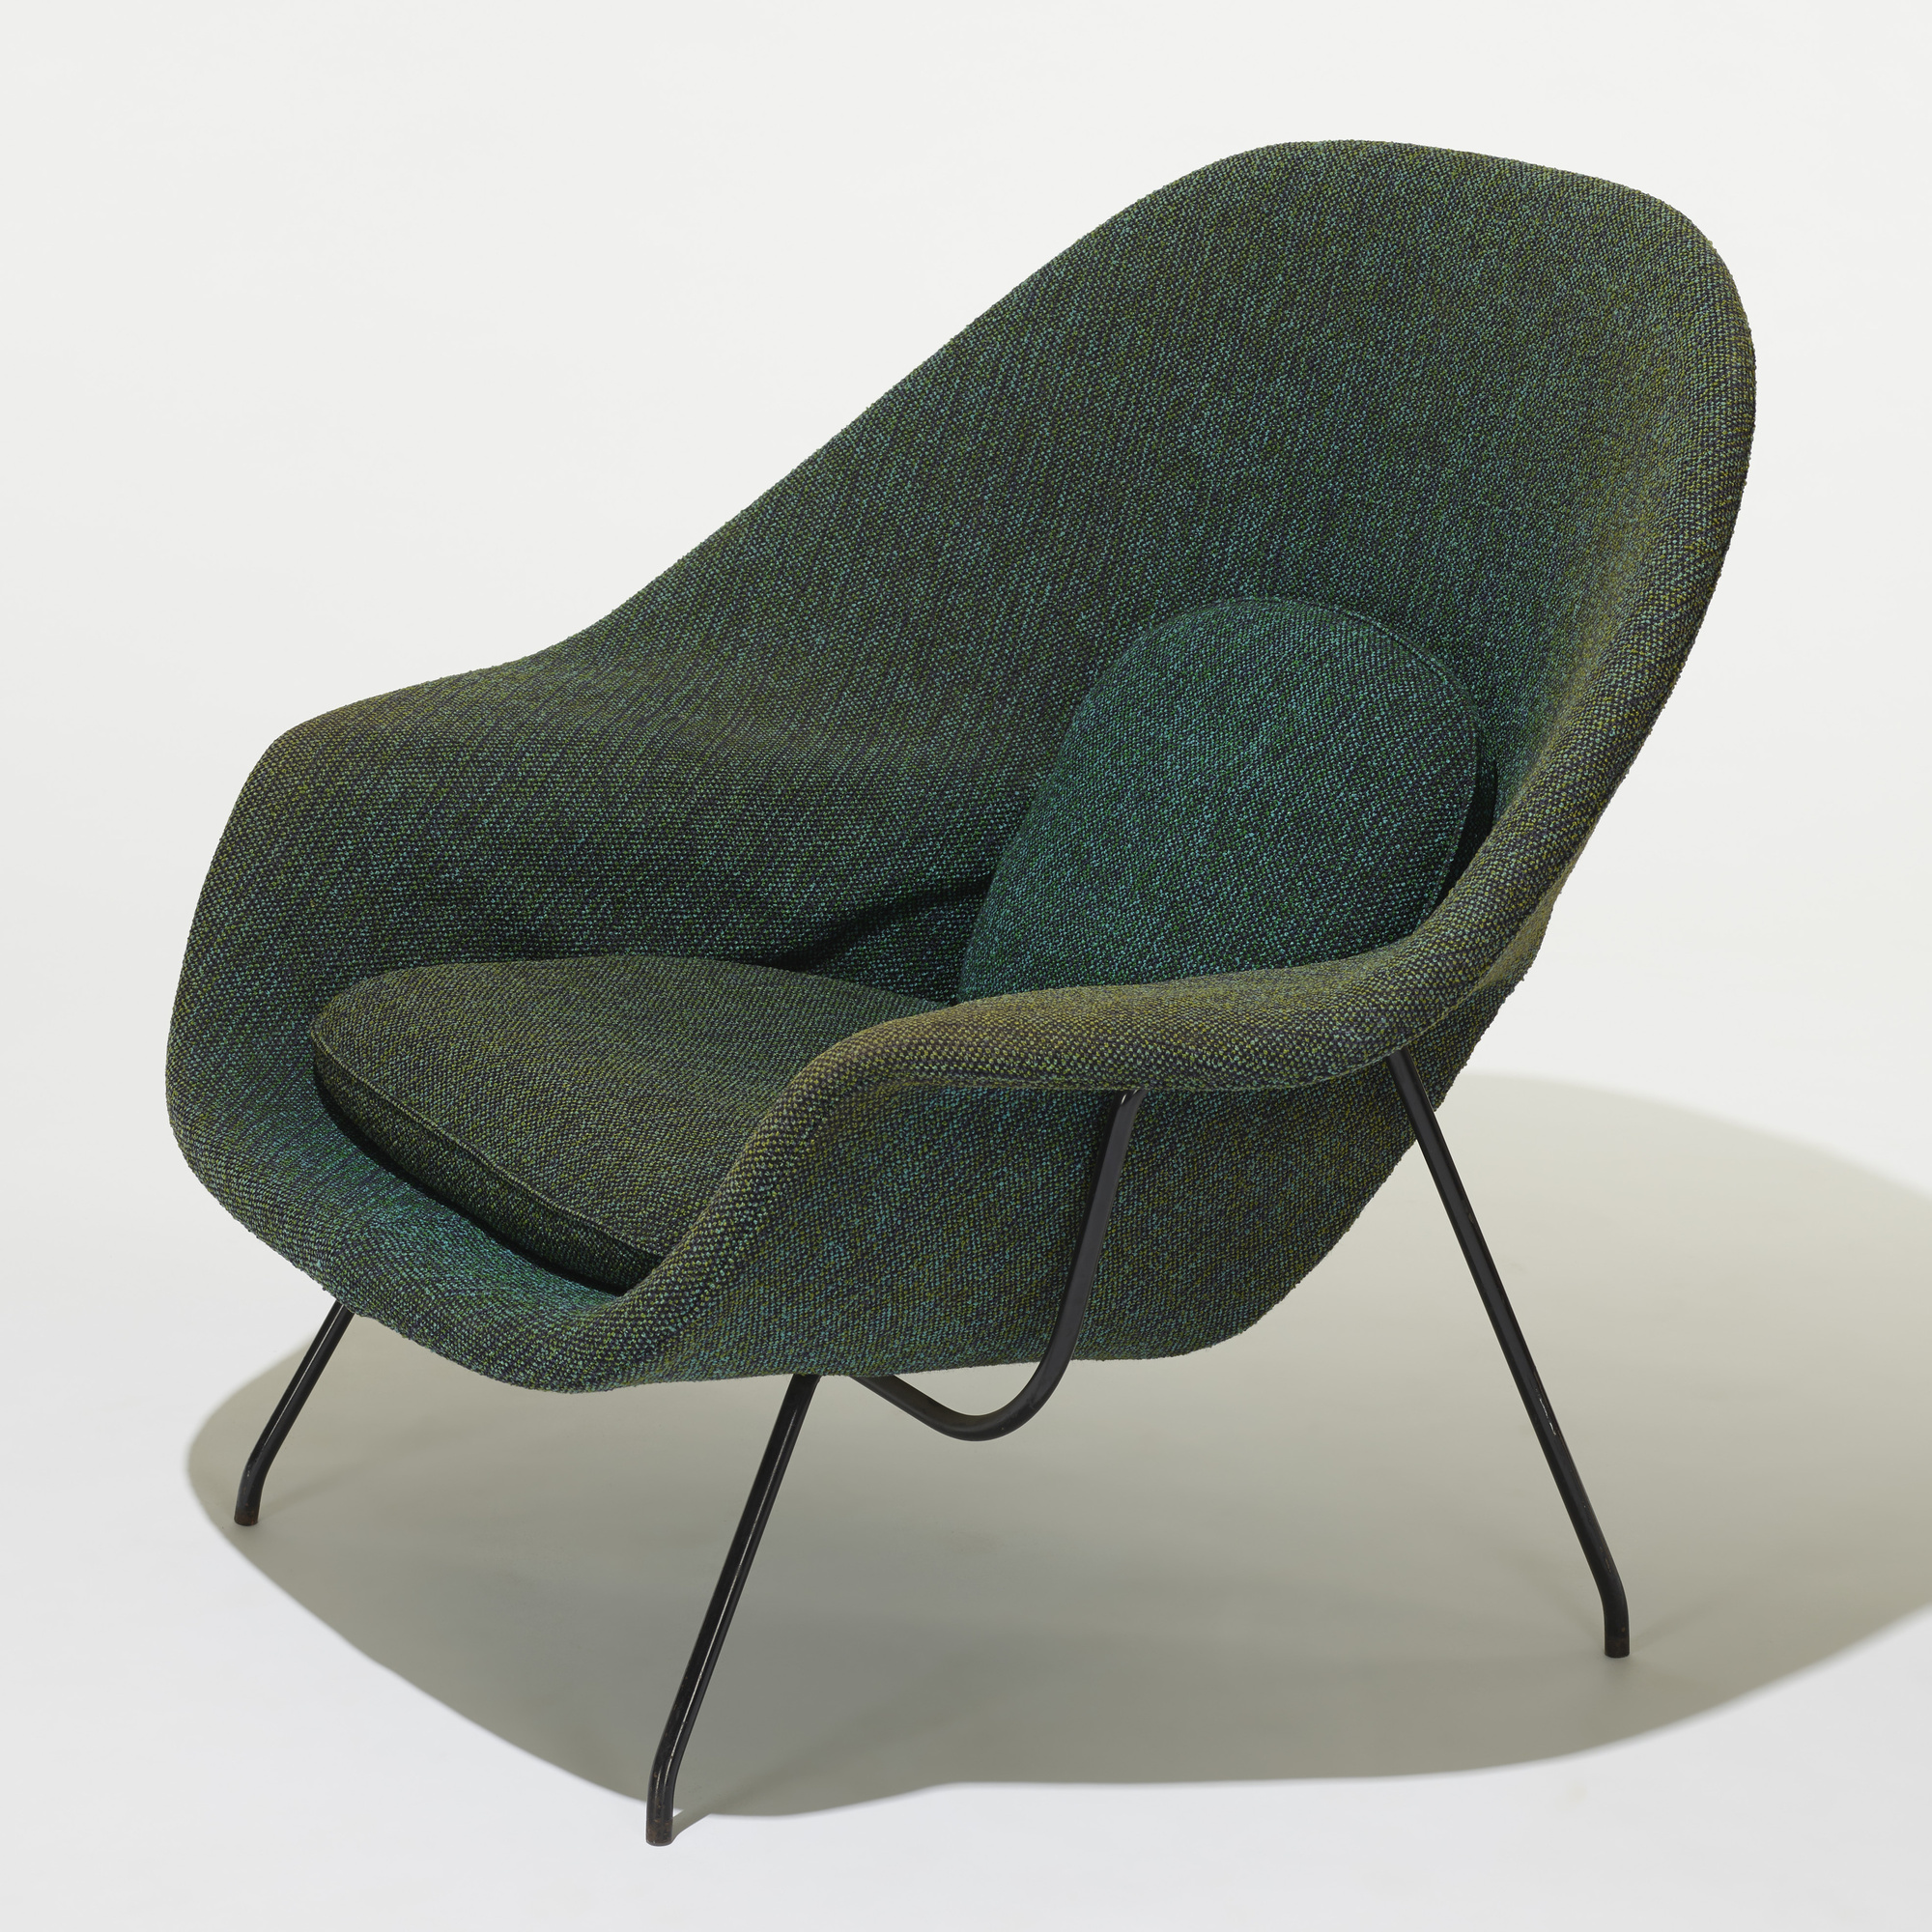 229 Eero Saarinen Womb chair and ottoman American Design 15